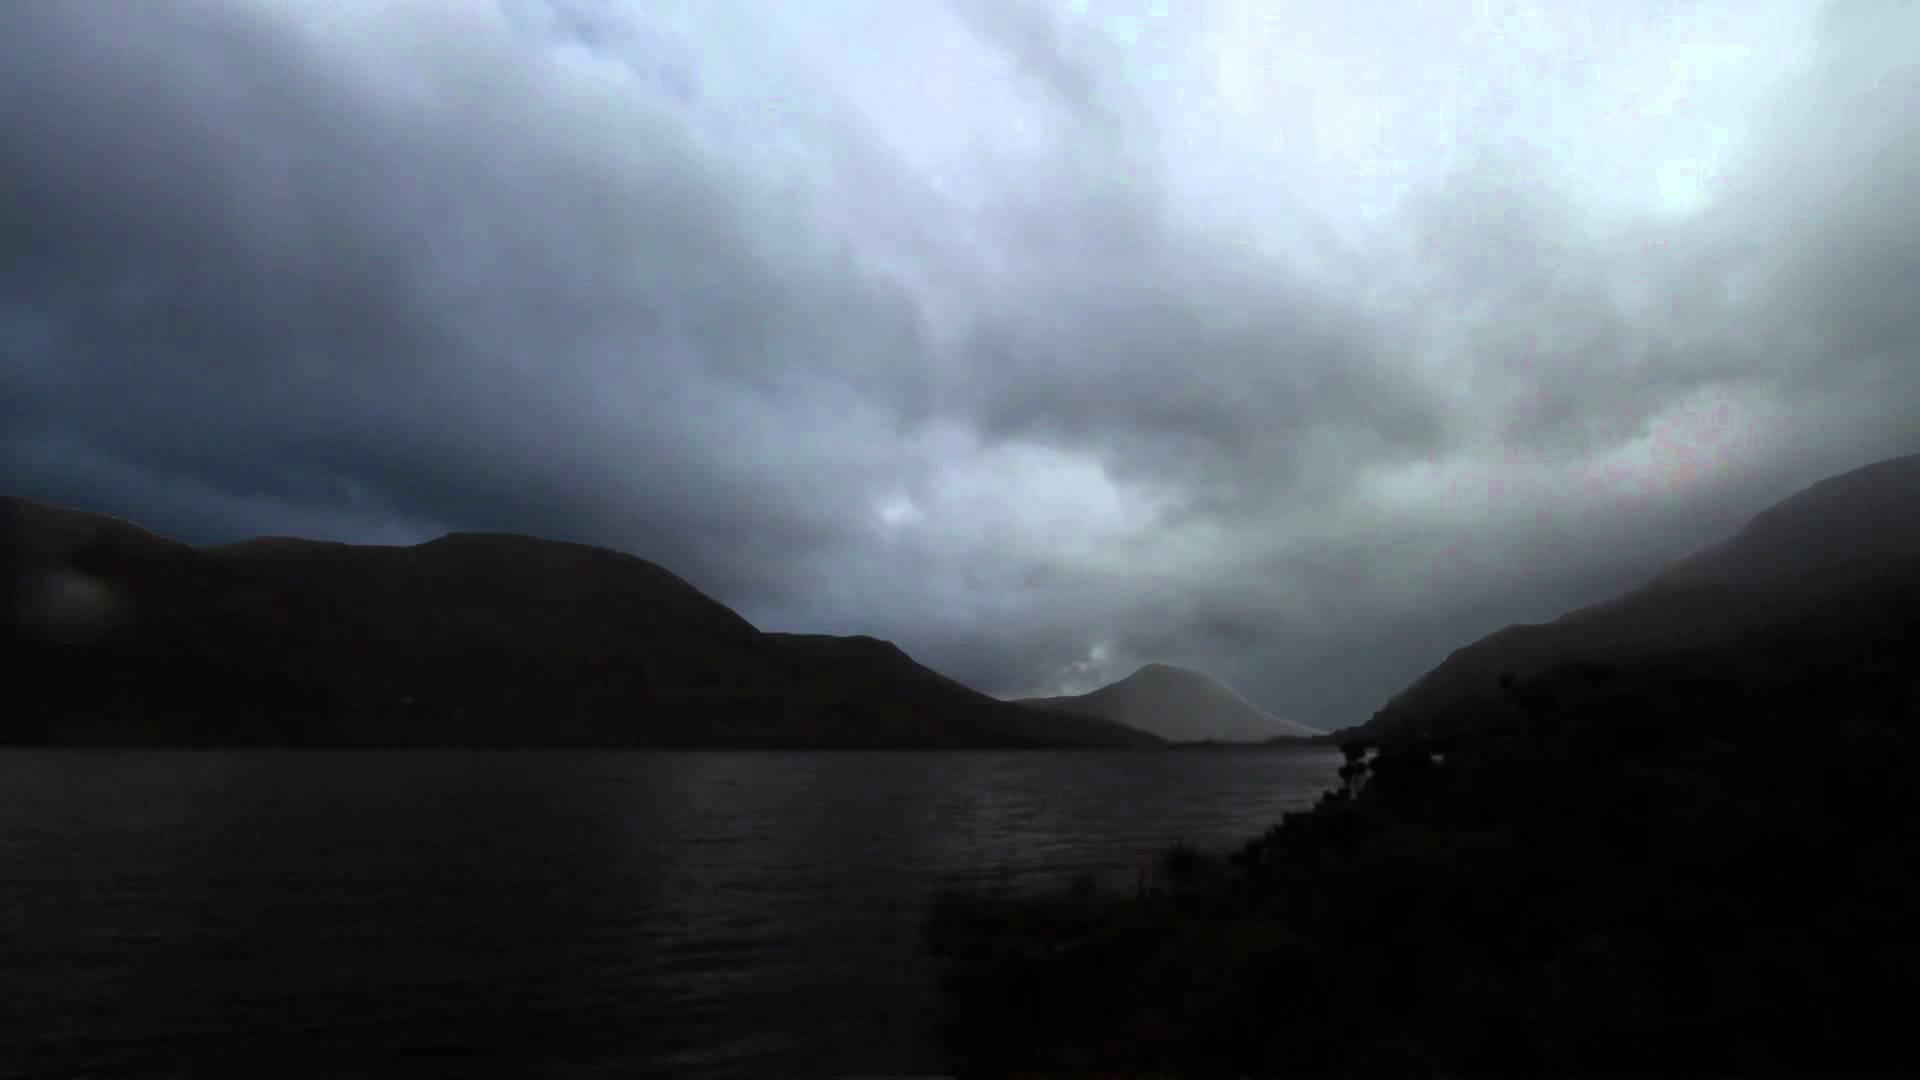 ROADS, storm, lightning, mountains, ireland, connemara, lightning ...